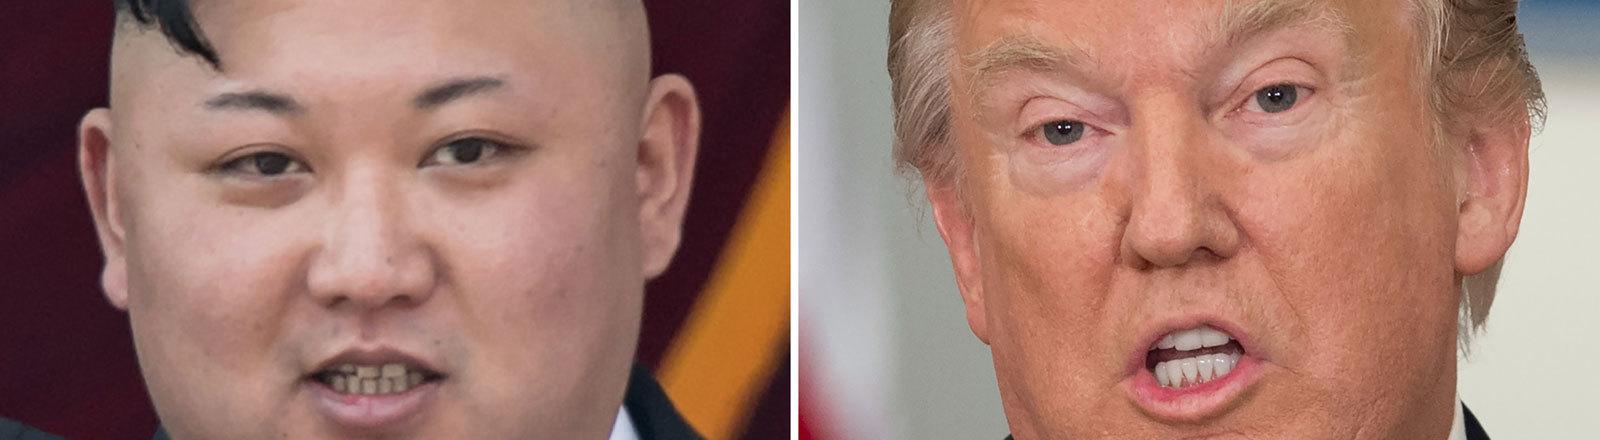 Nordkoreas Präsident Kim Jong-Un und US-Präsident Donald Trump.